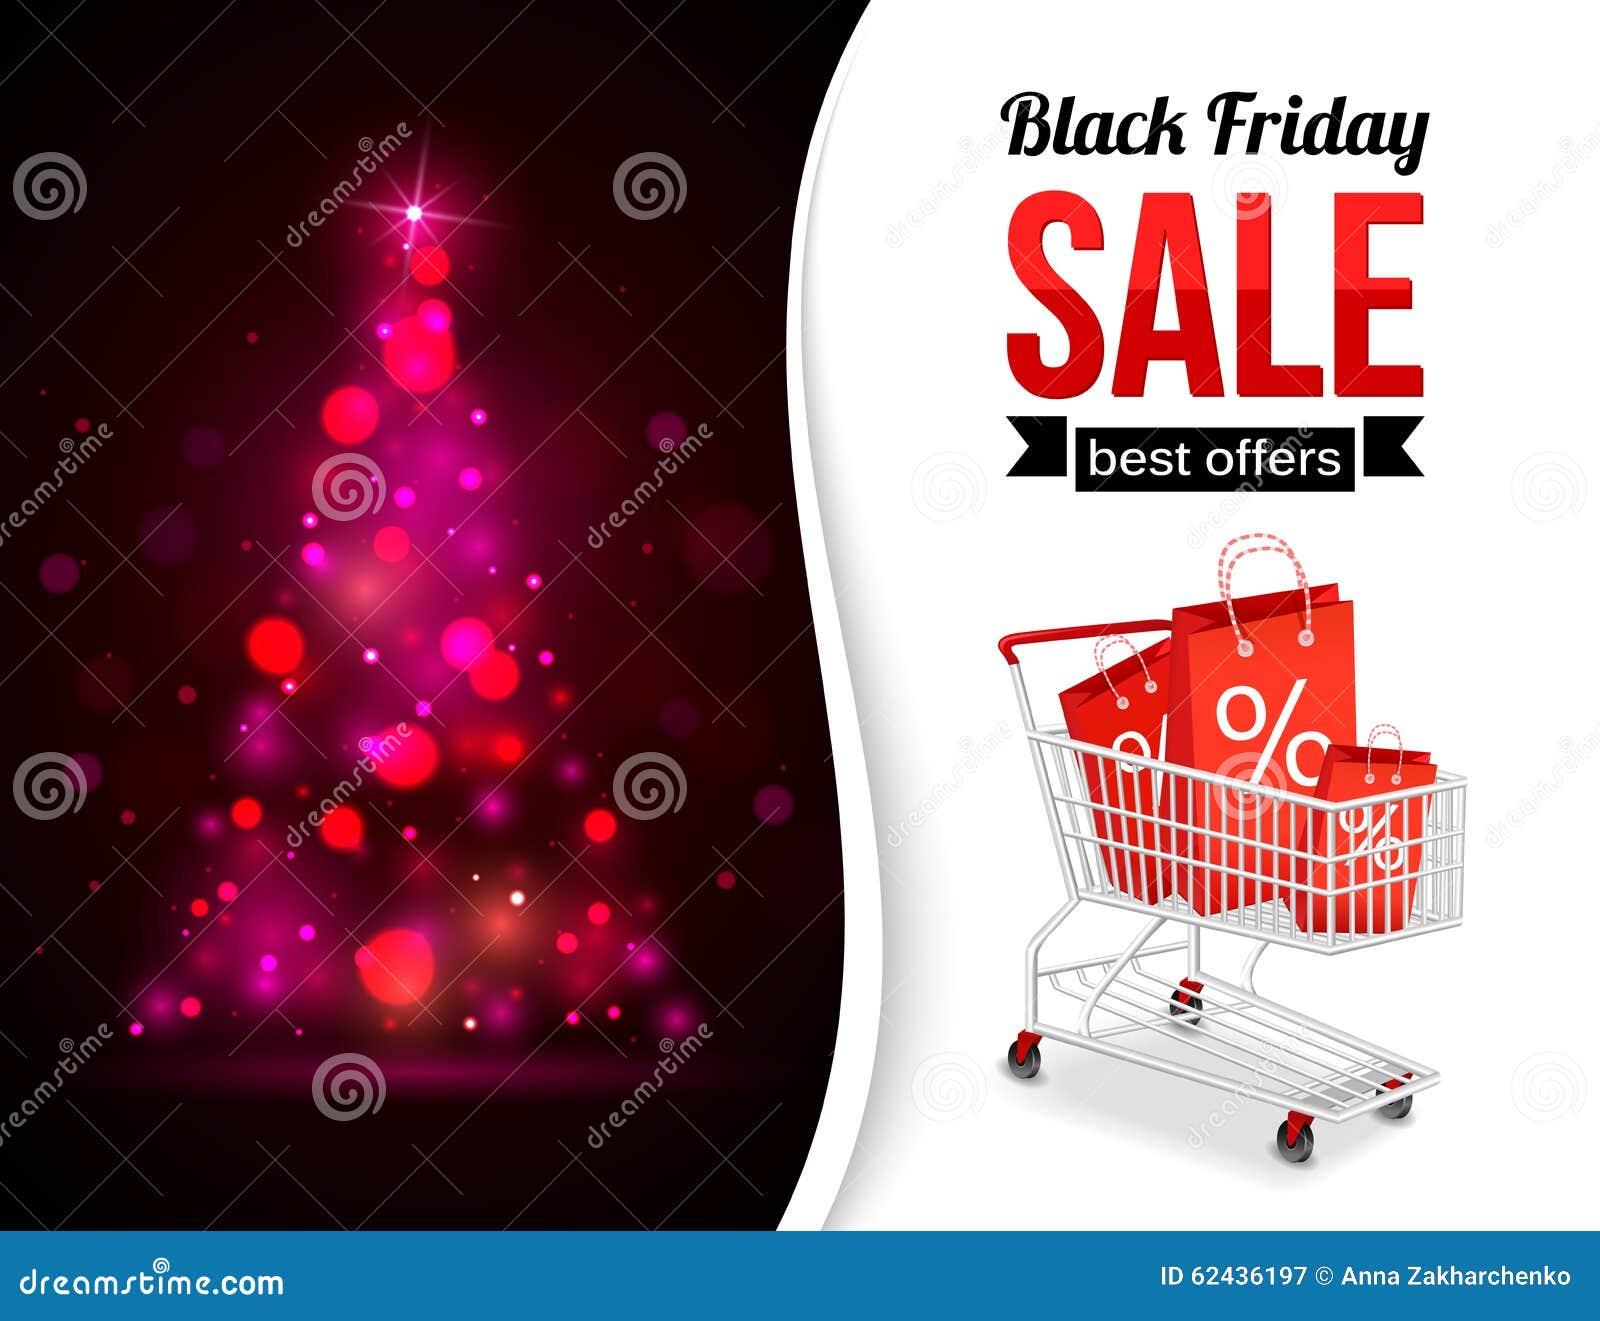 Black Friday Sale Shining Typographical Background Stock